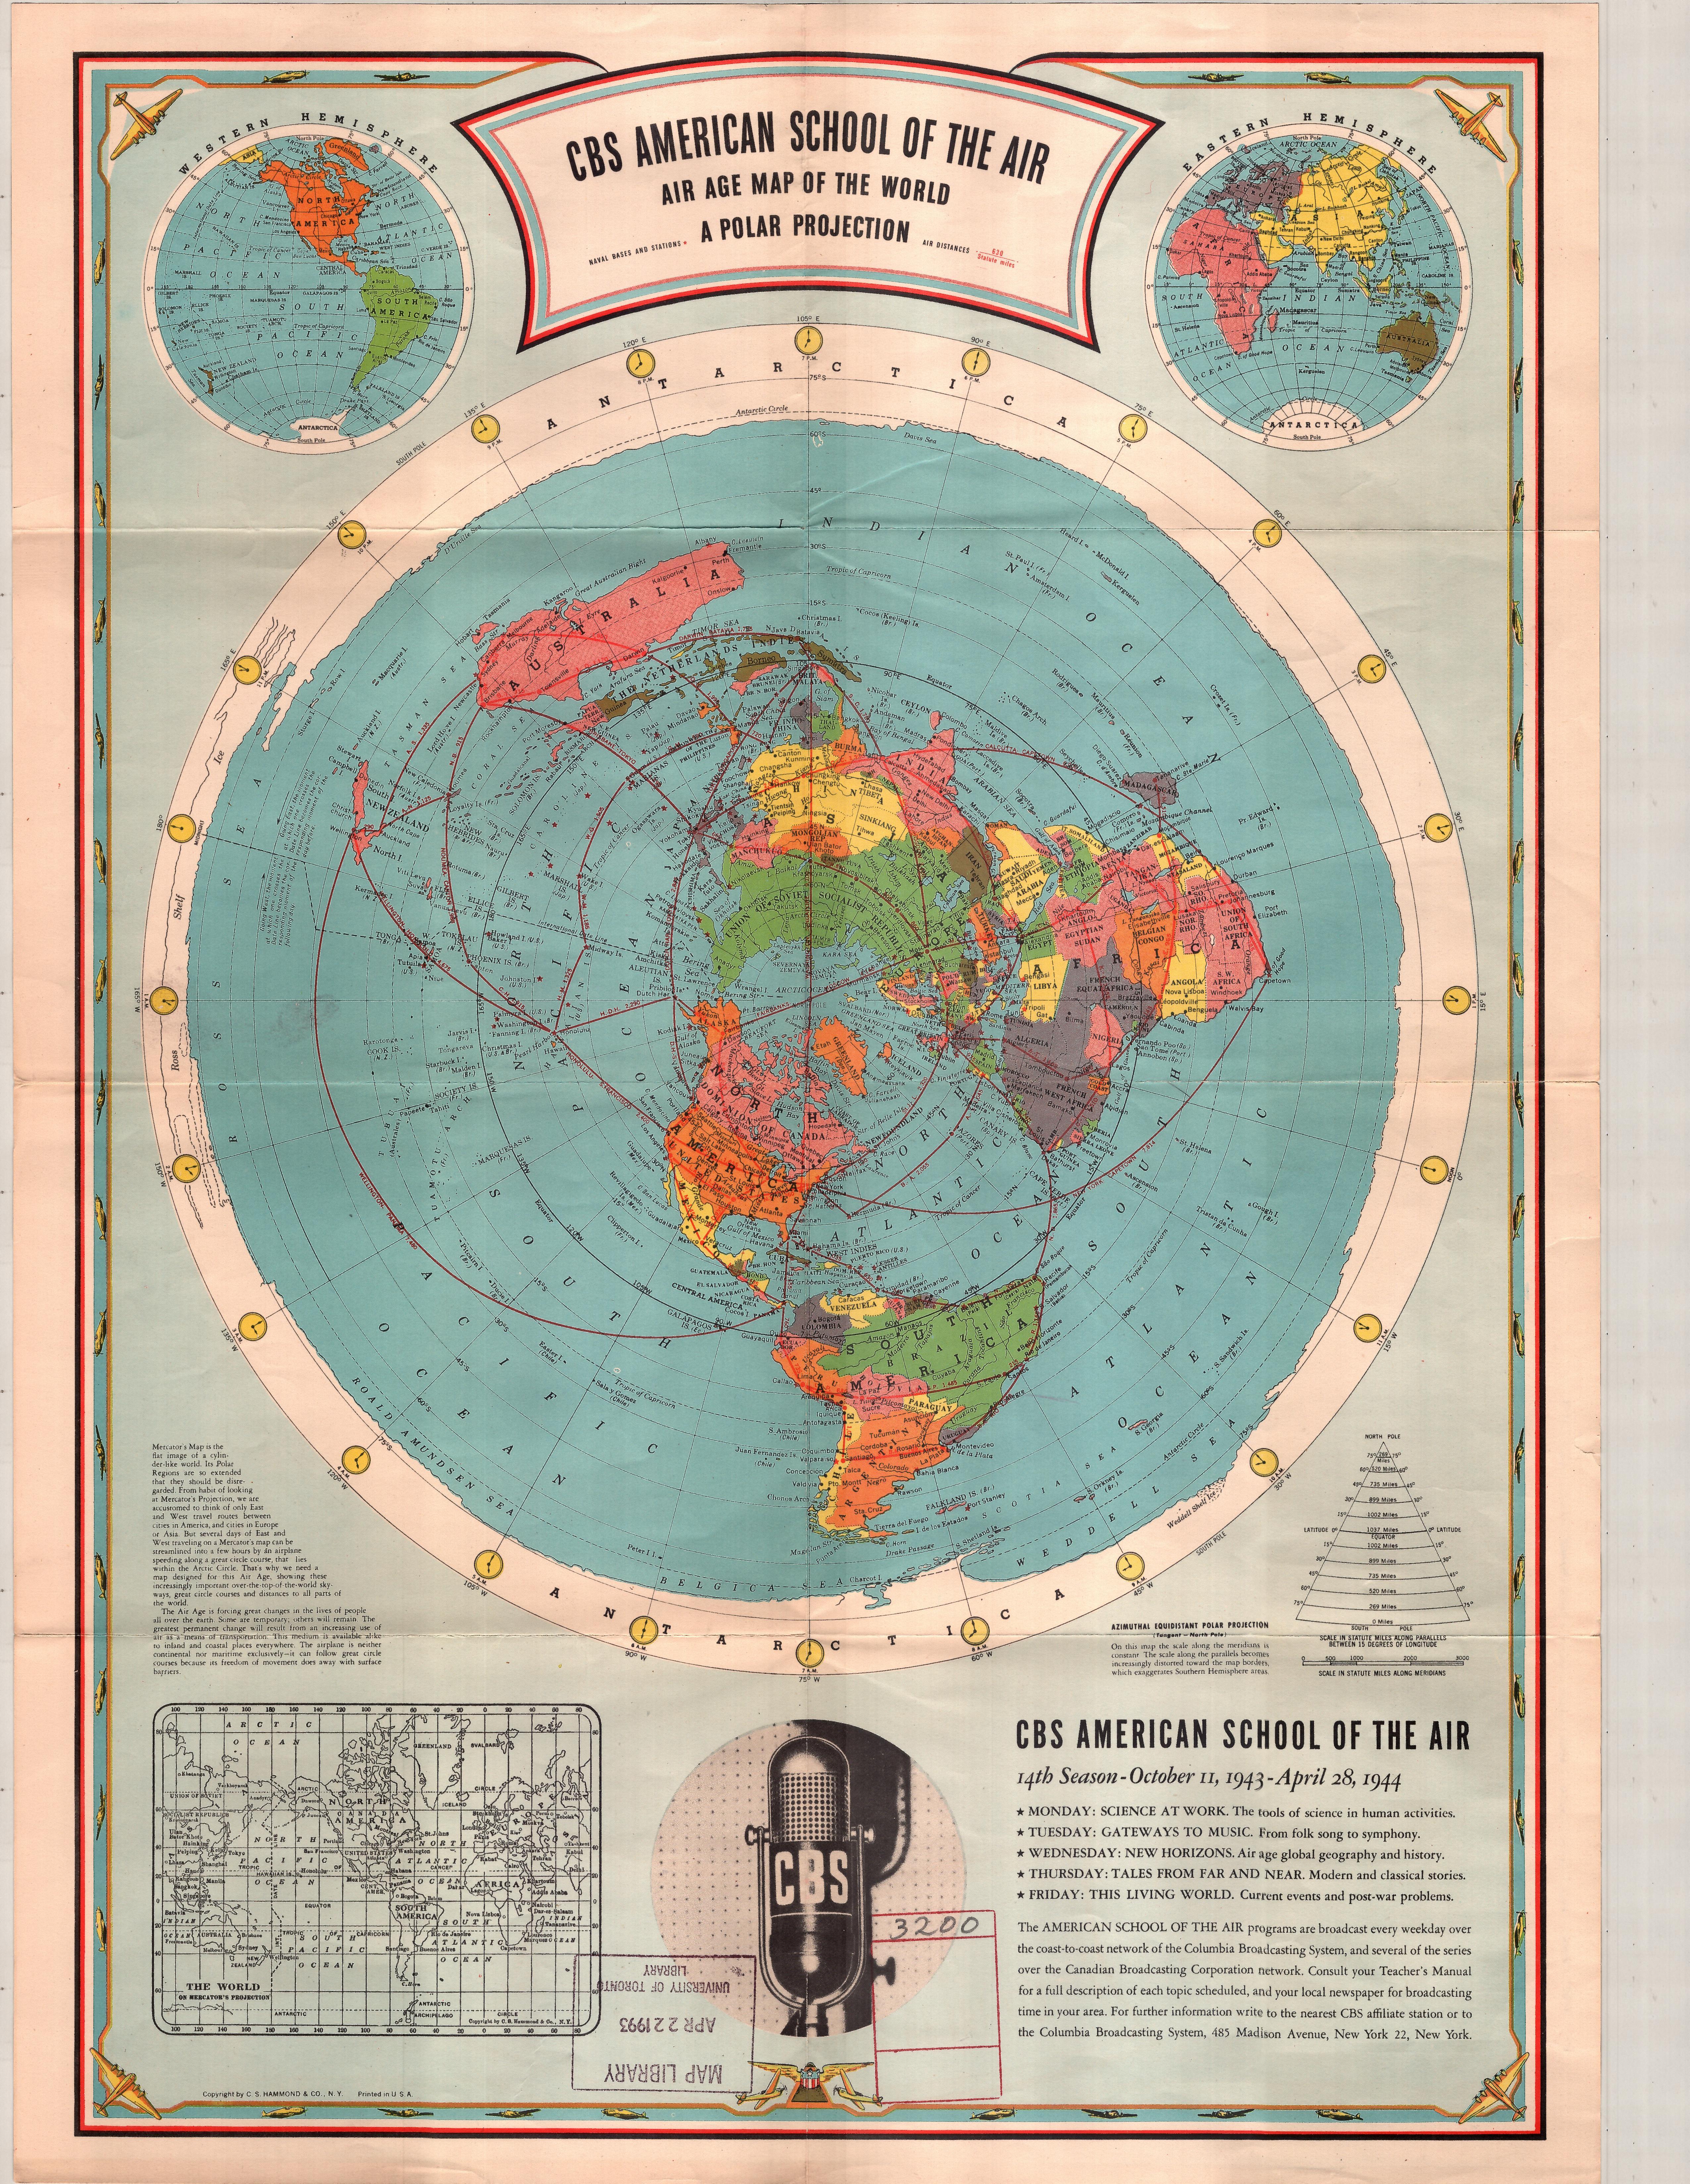 1944 cbs american school of the air polar projection world map 1944 cbs american school of the air polar projection world map 5102x6592 gumiabroncs Gallery